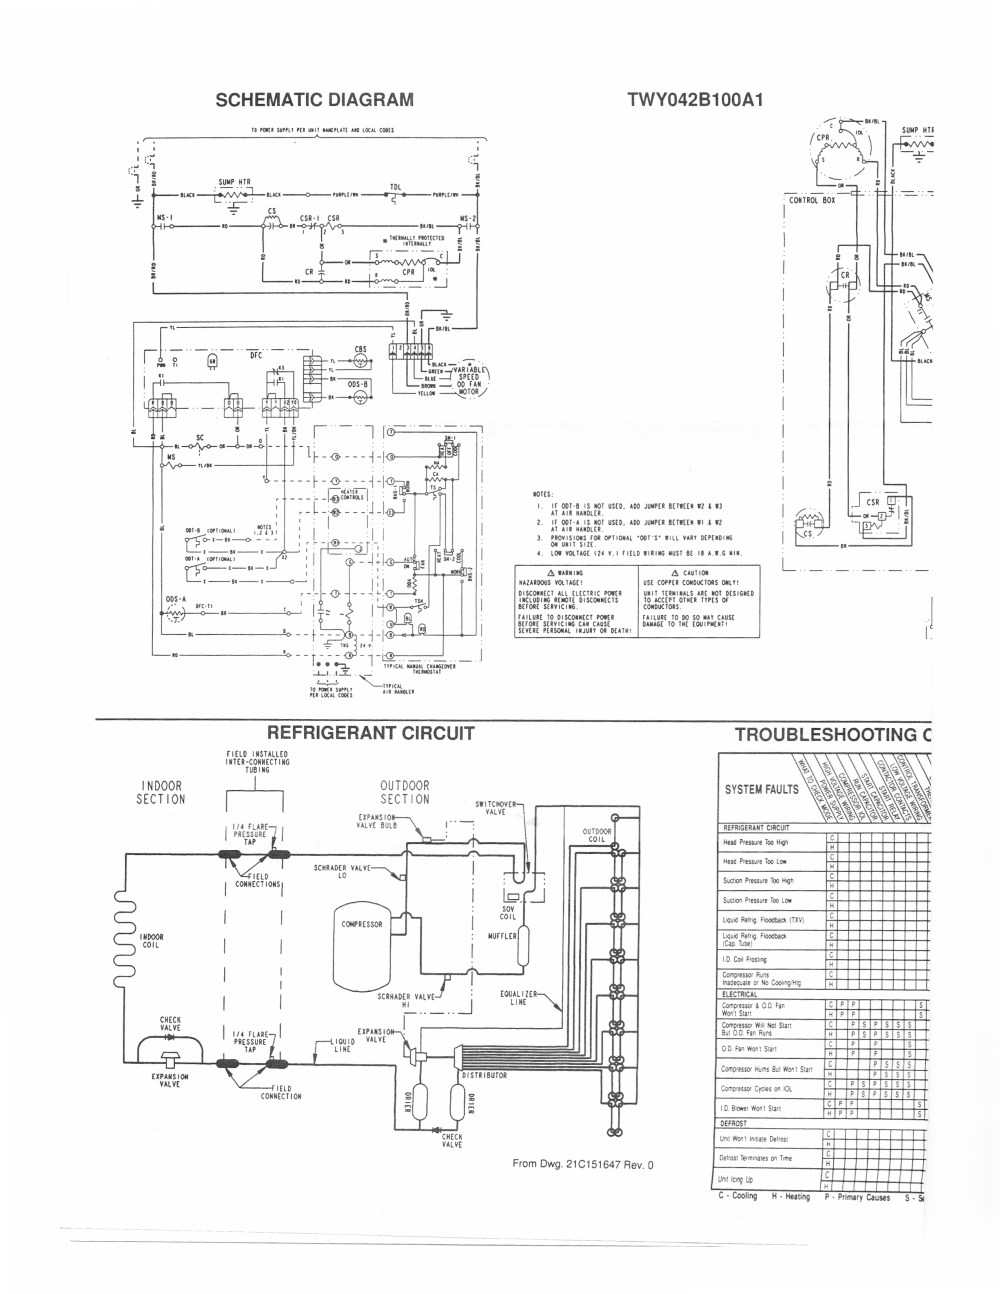 medium resolution of trane heat pump wiring diagram trane air conditioner wiring schematic handler diagram for solidfonts new